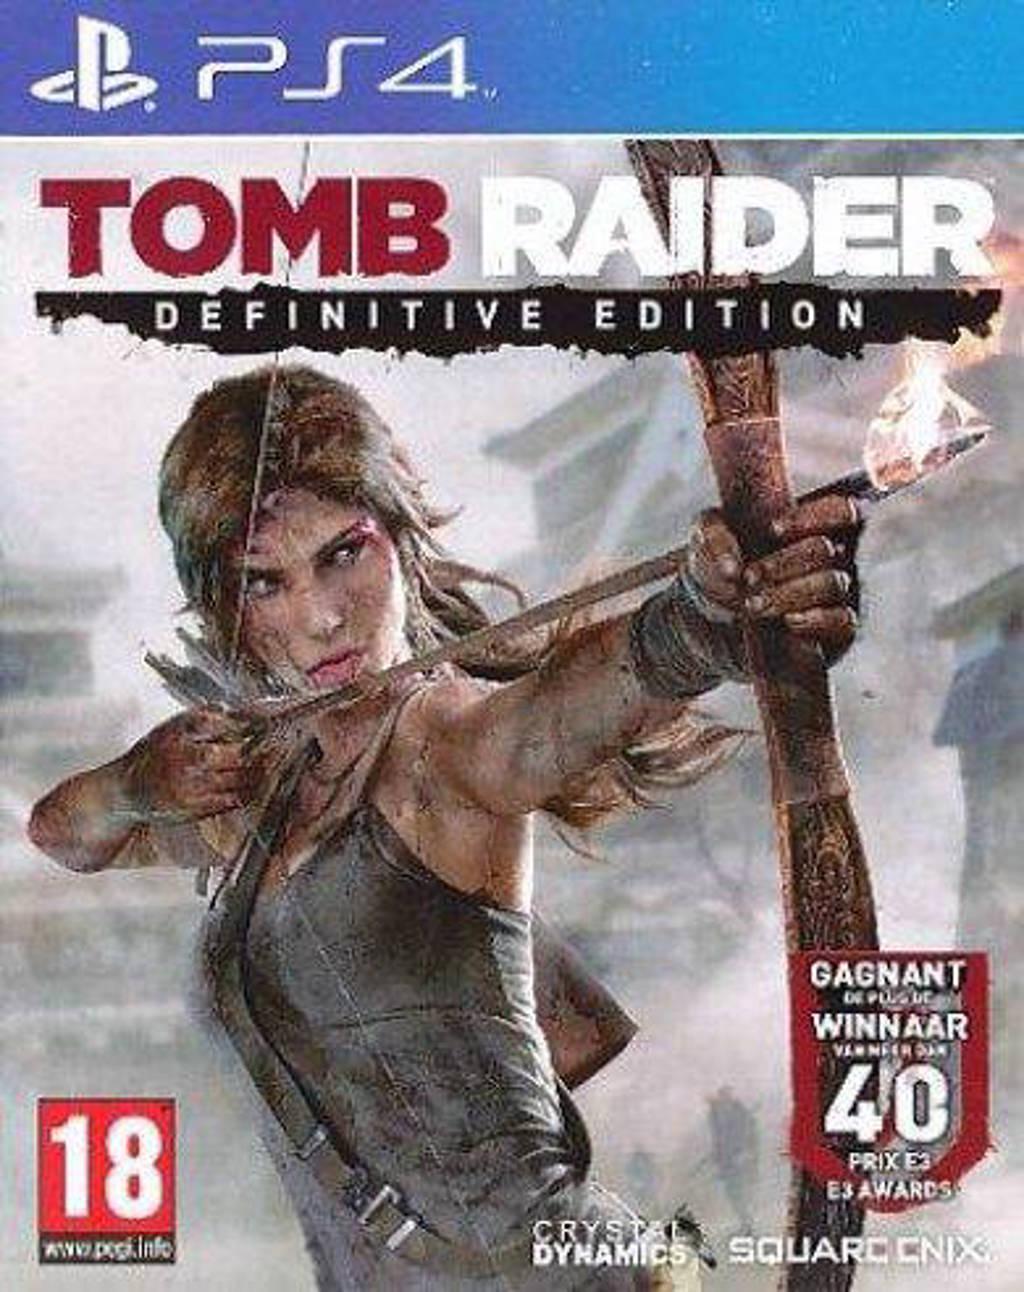 Tomb raider (Definitive edition) (PlayStation 4)